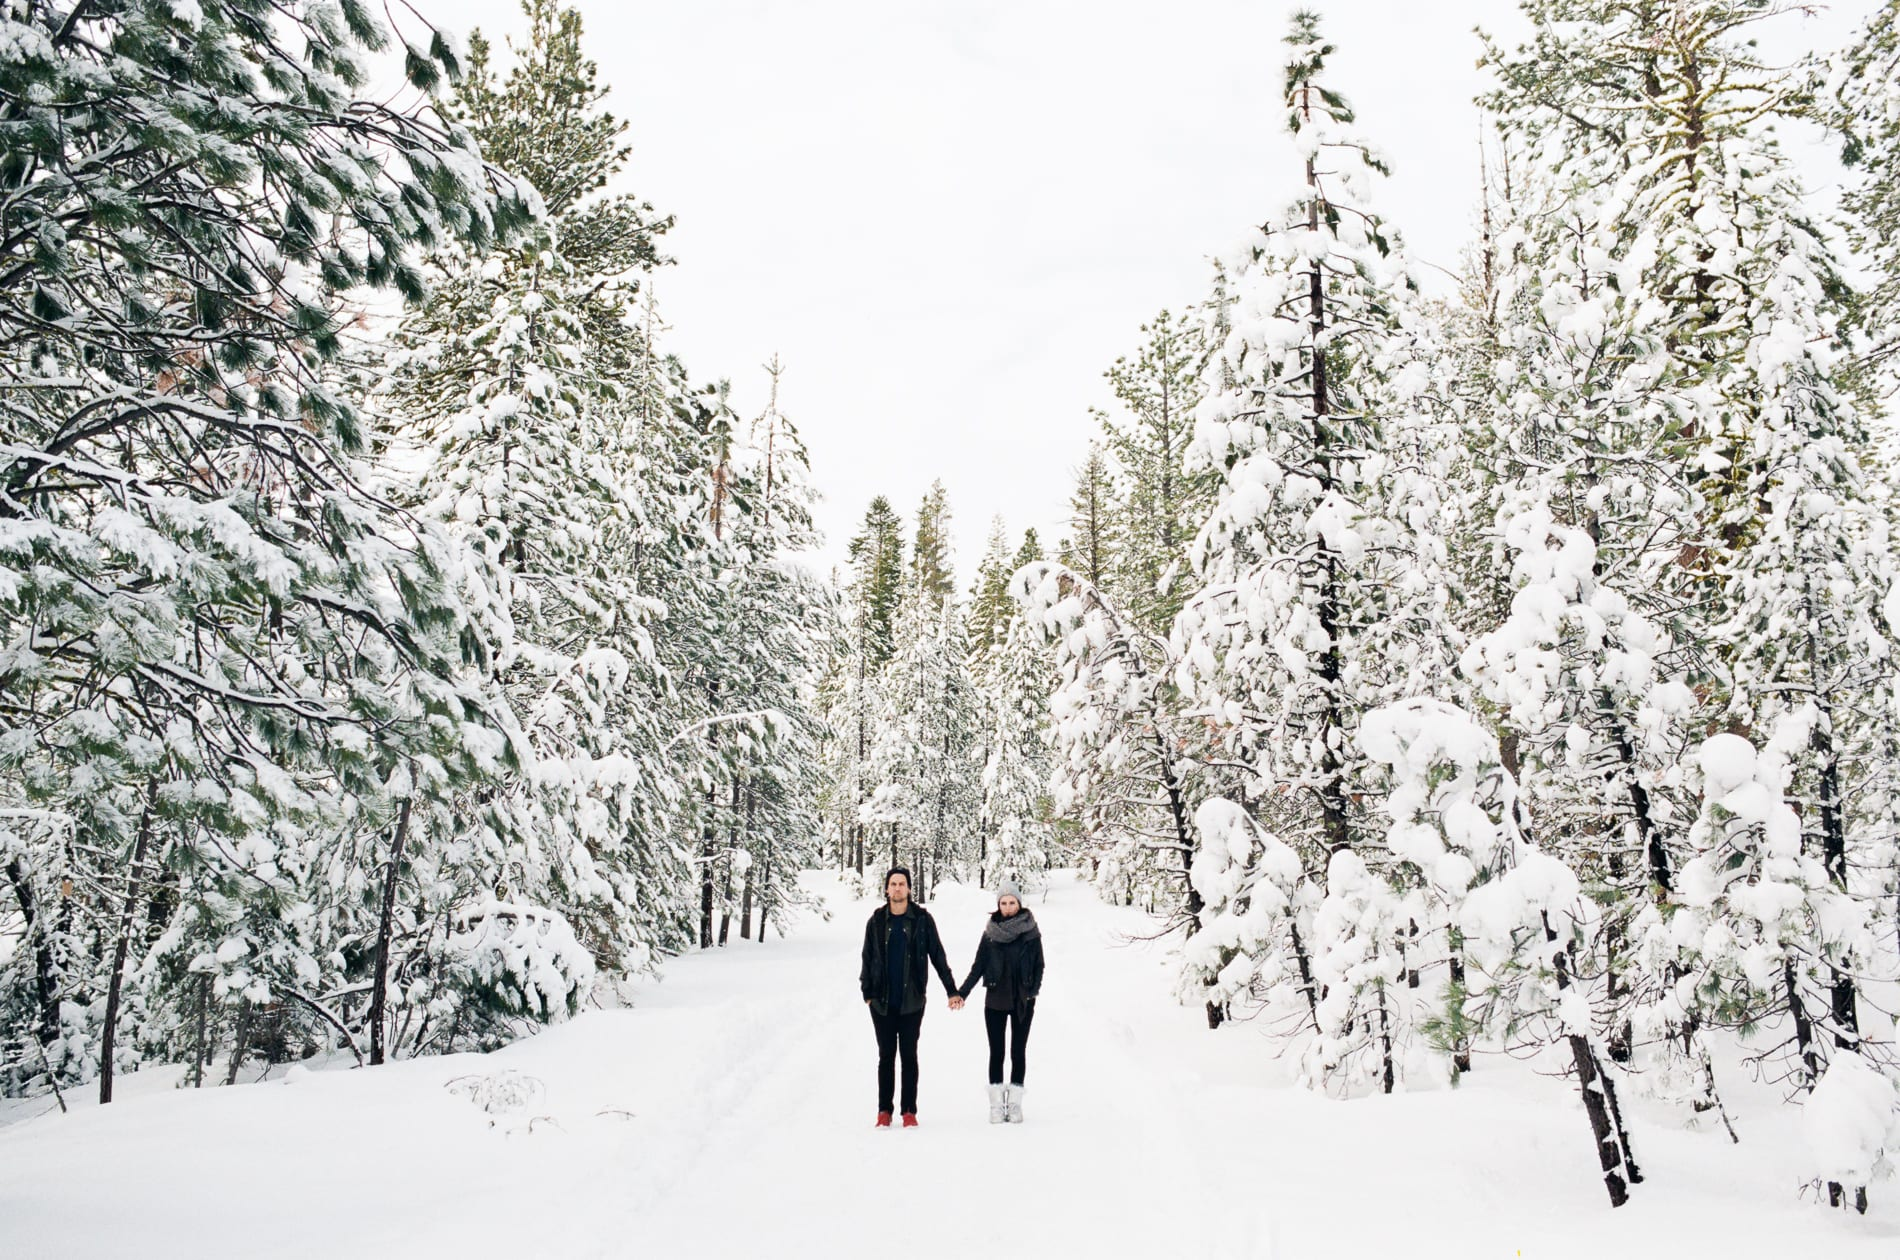 mt-lassen-winter-snow-couples-photo-6